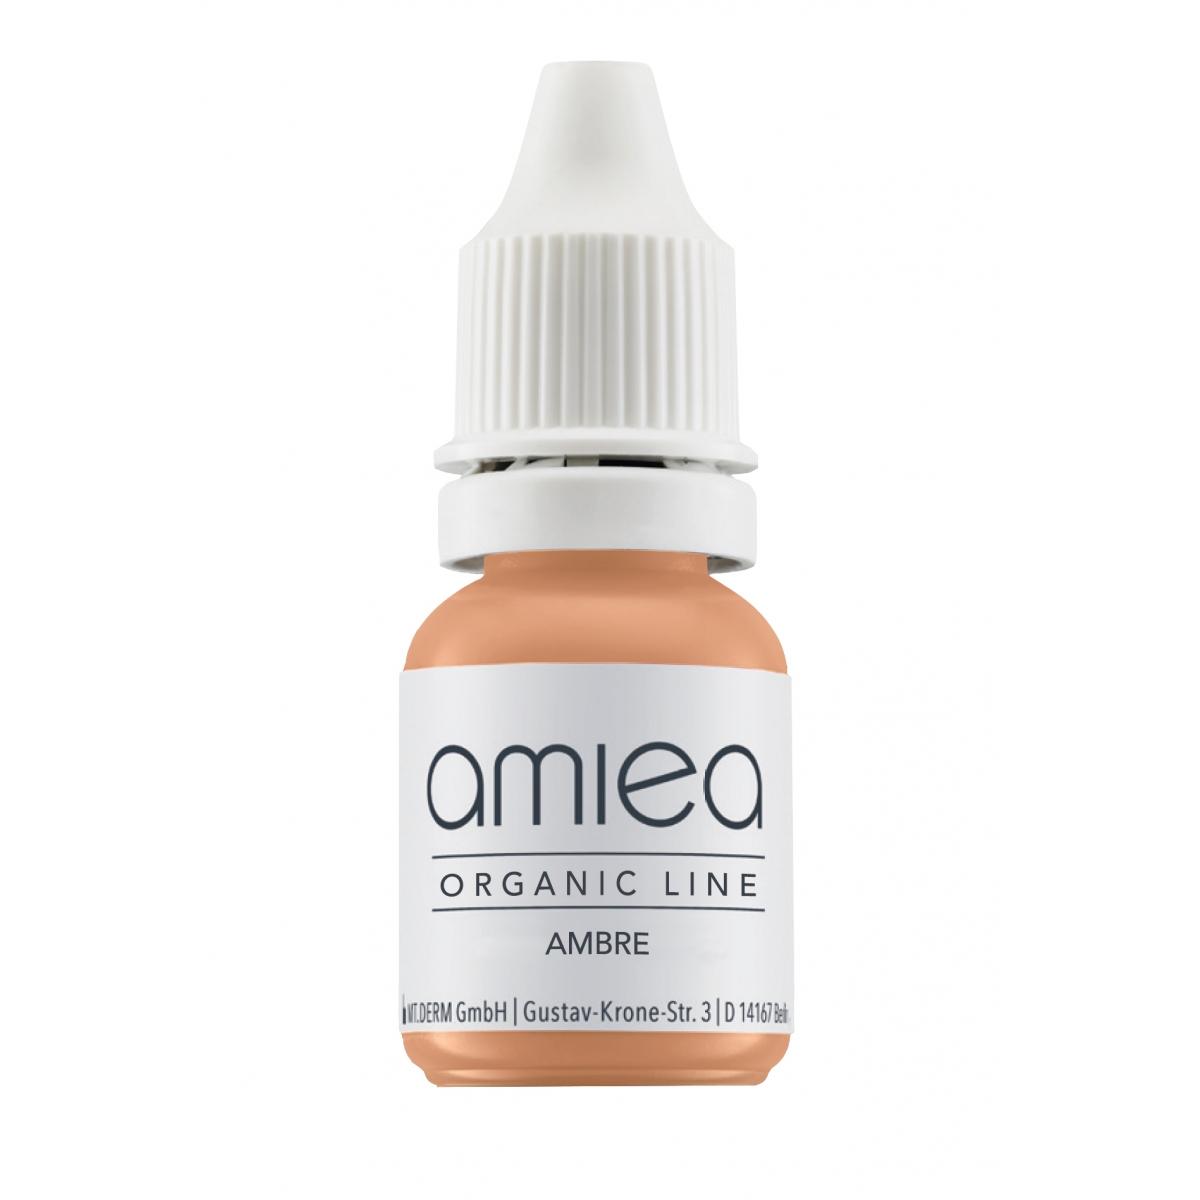 ORGANIC LINE (5ml)  - PIGMENT CORRECTEUR AMBRE ORGANICLINE AMIEA (5 ml)